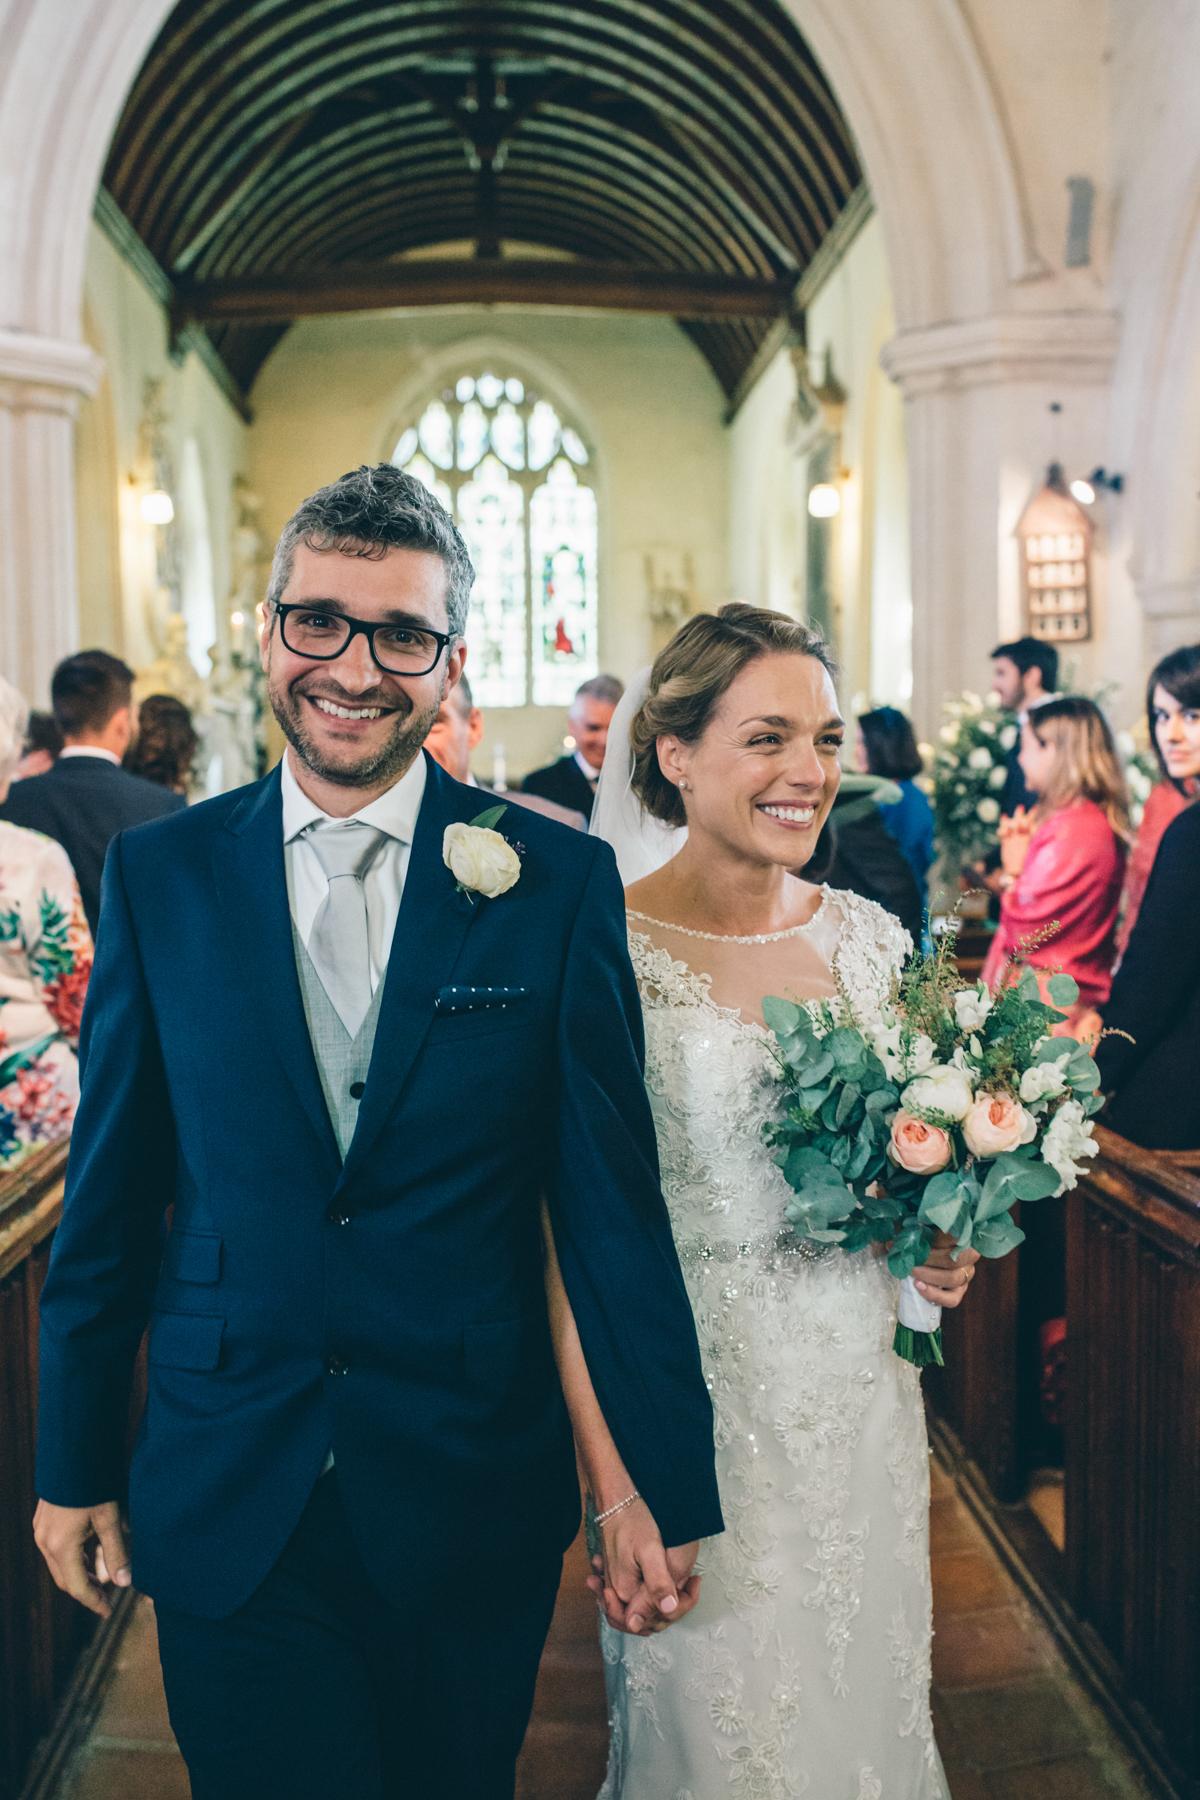 Sarah + Caco Tipi Village Green Wedding Buckinghamshire NaomiJanePhotography-48.jpg